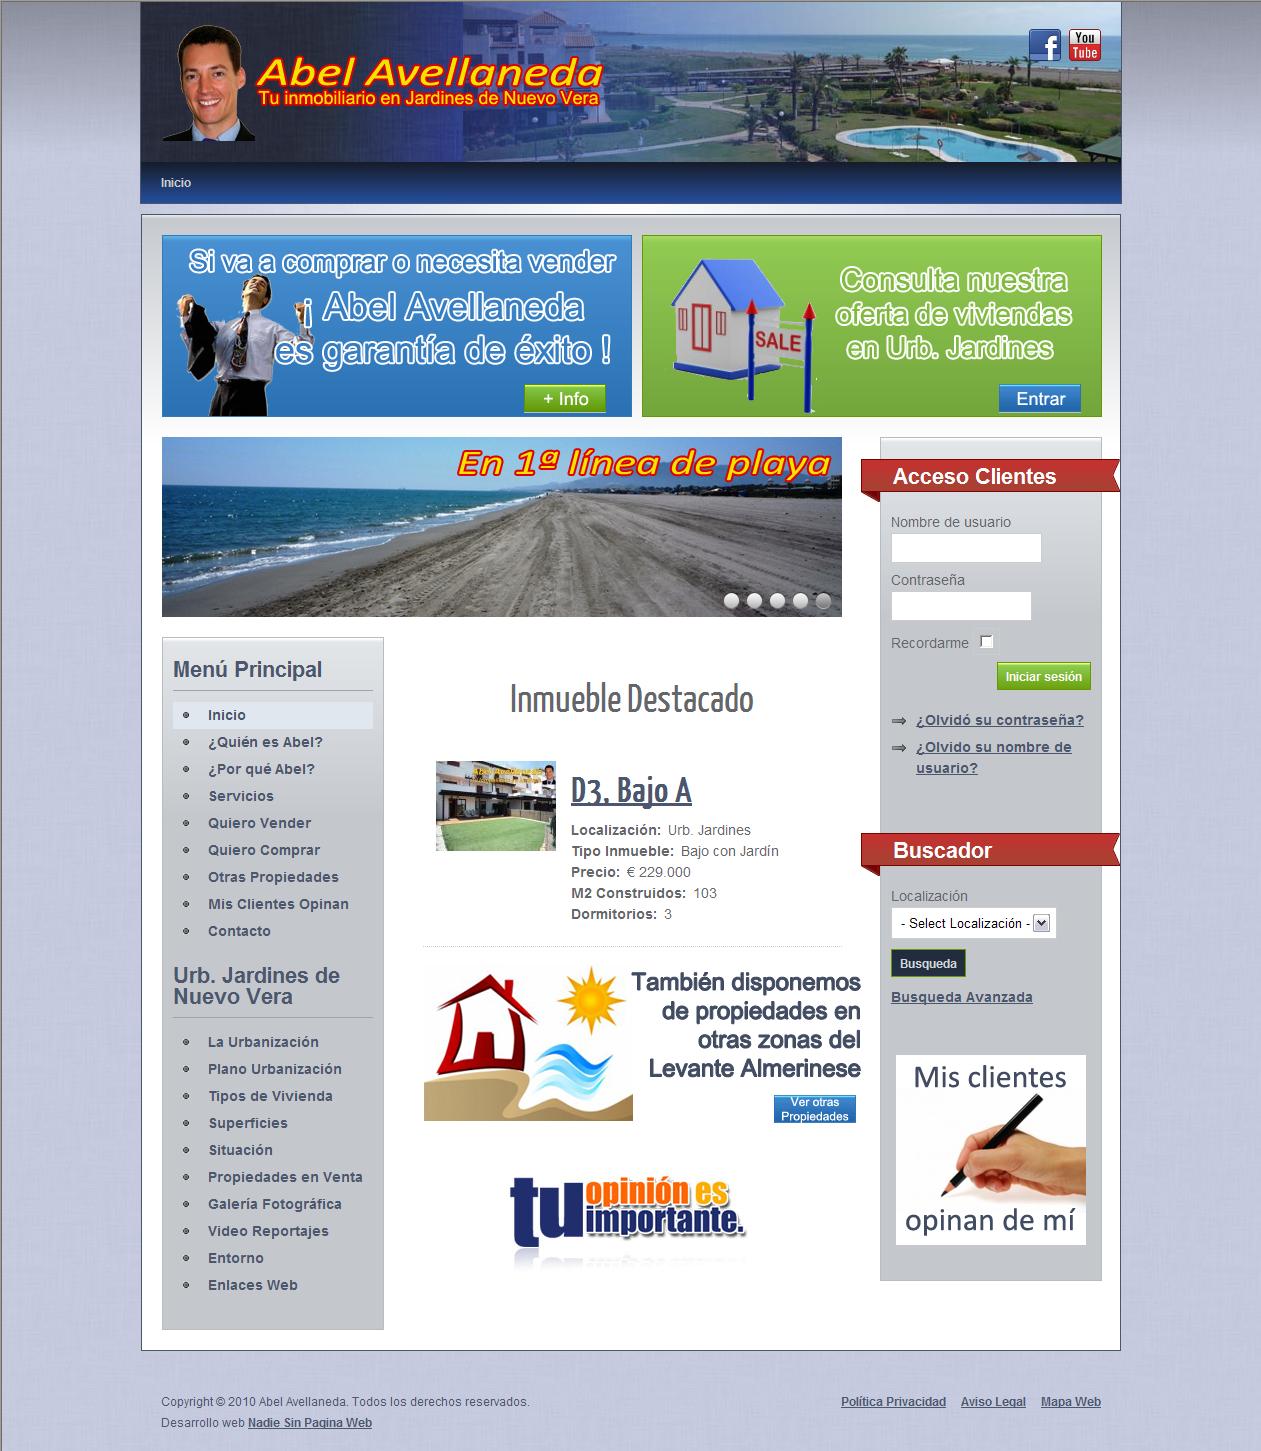 www.AbelAvellaneda.com